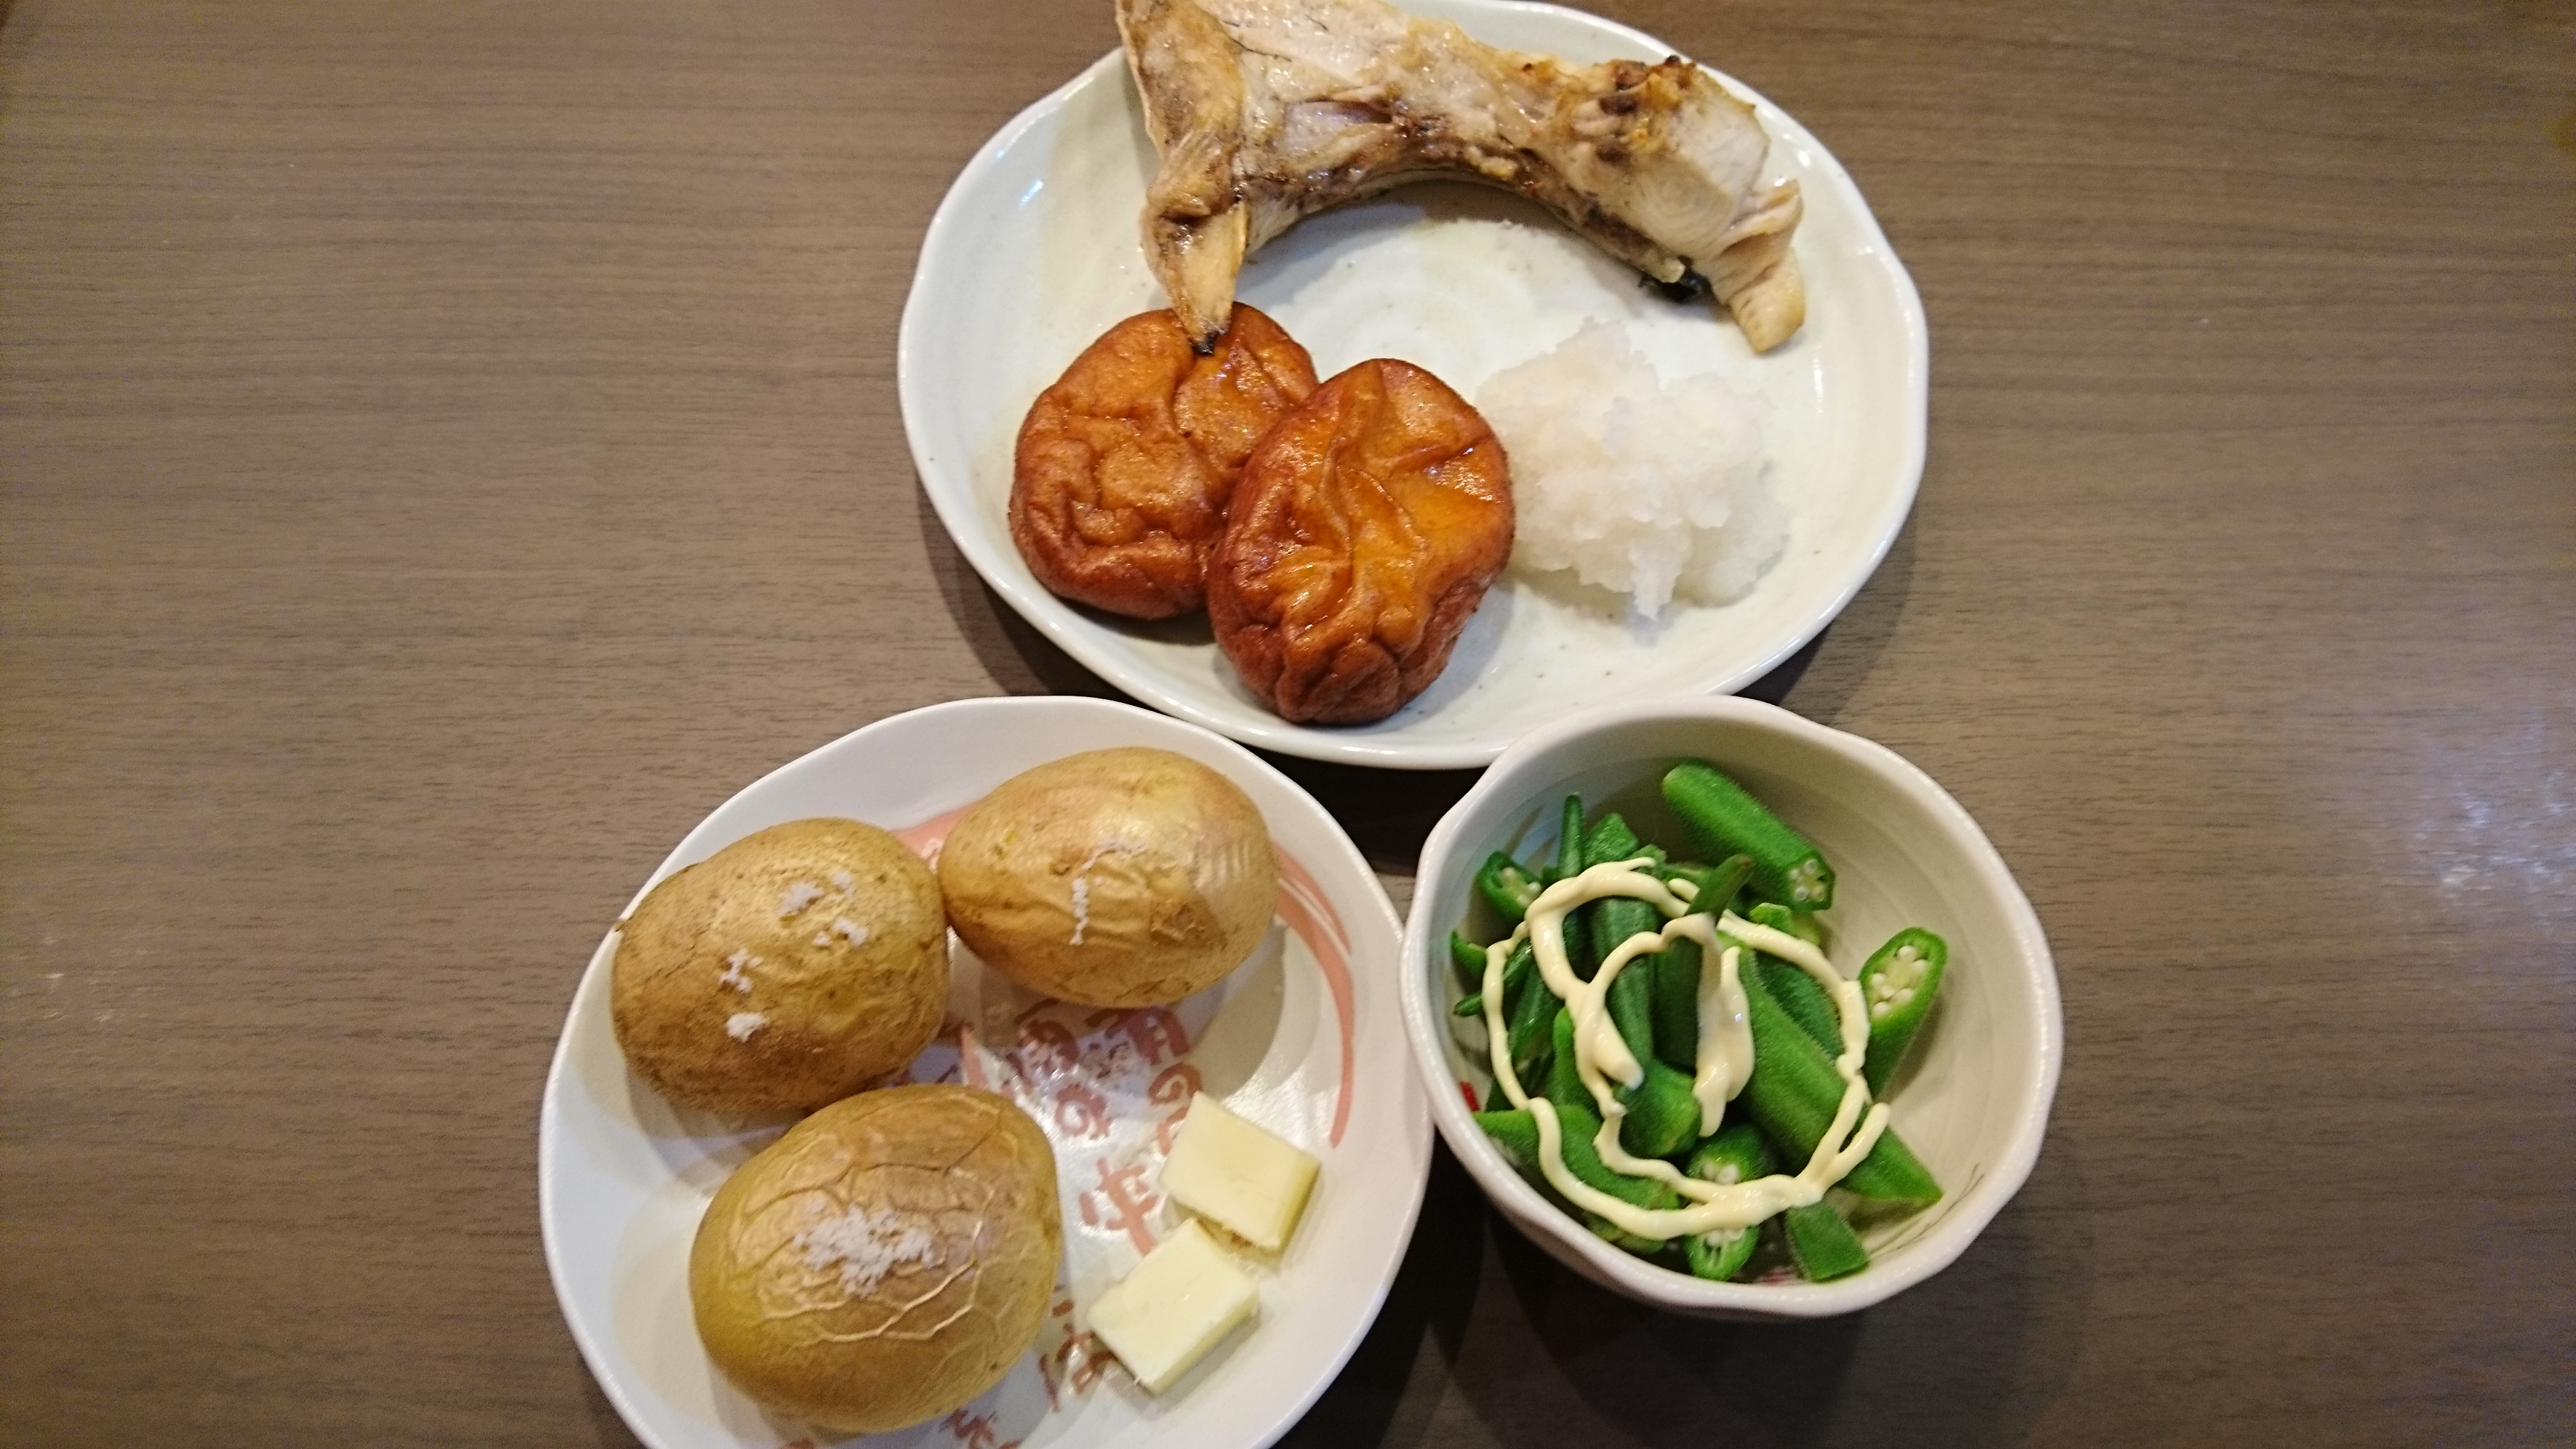 http://hashiguchi-seikotu.com/blog/about/DSC_1705.JPG